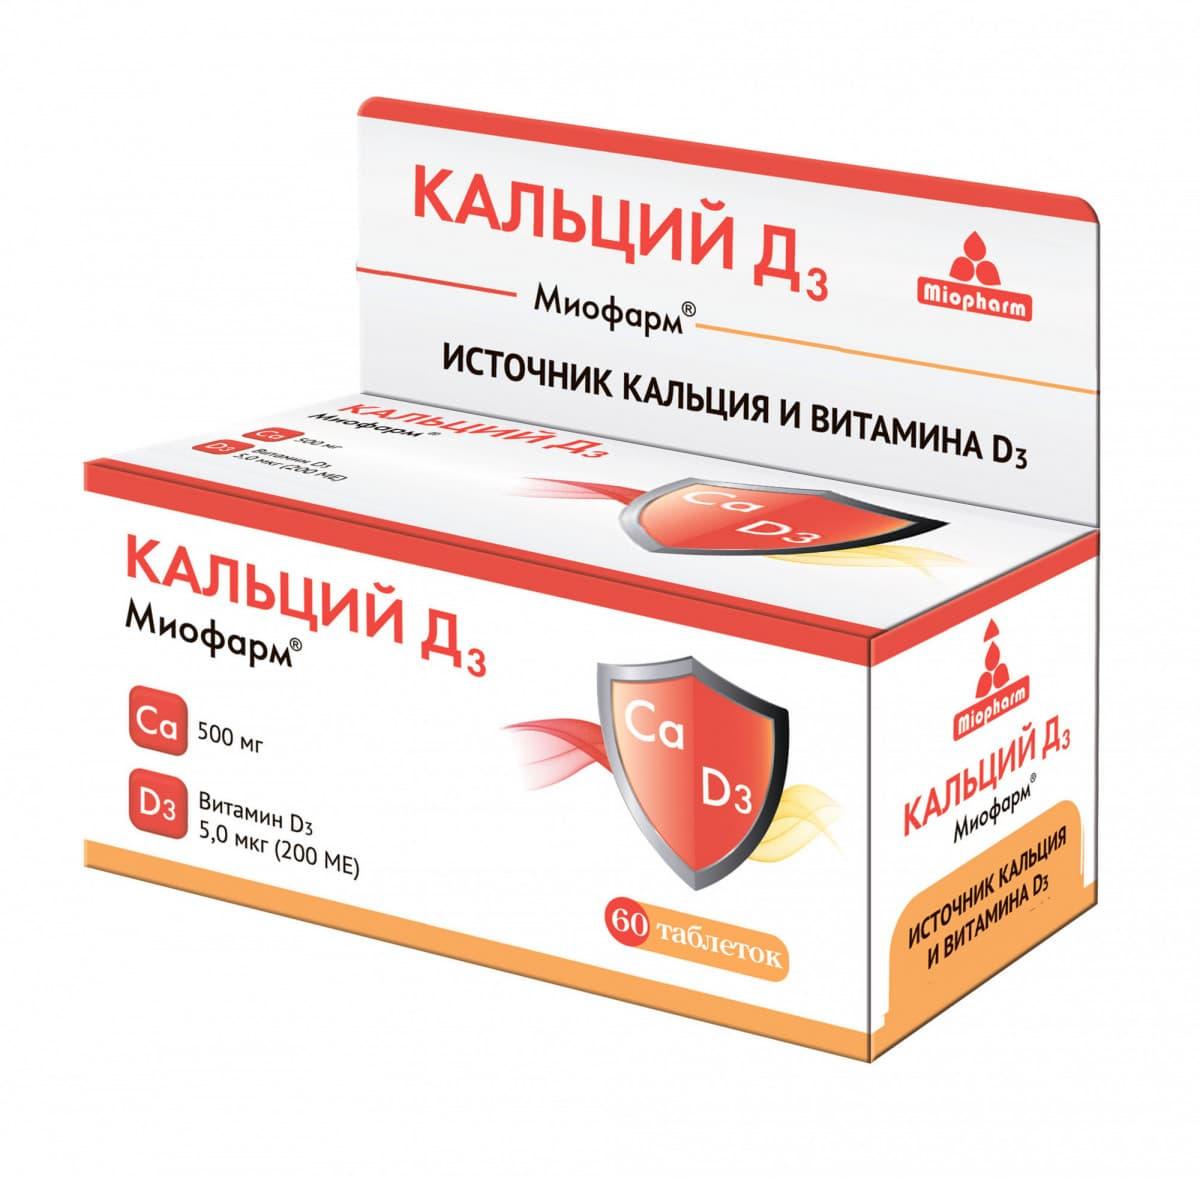 Картонная коробка под витамины